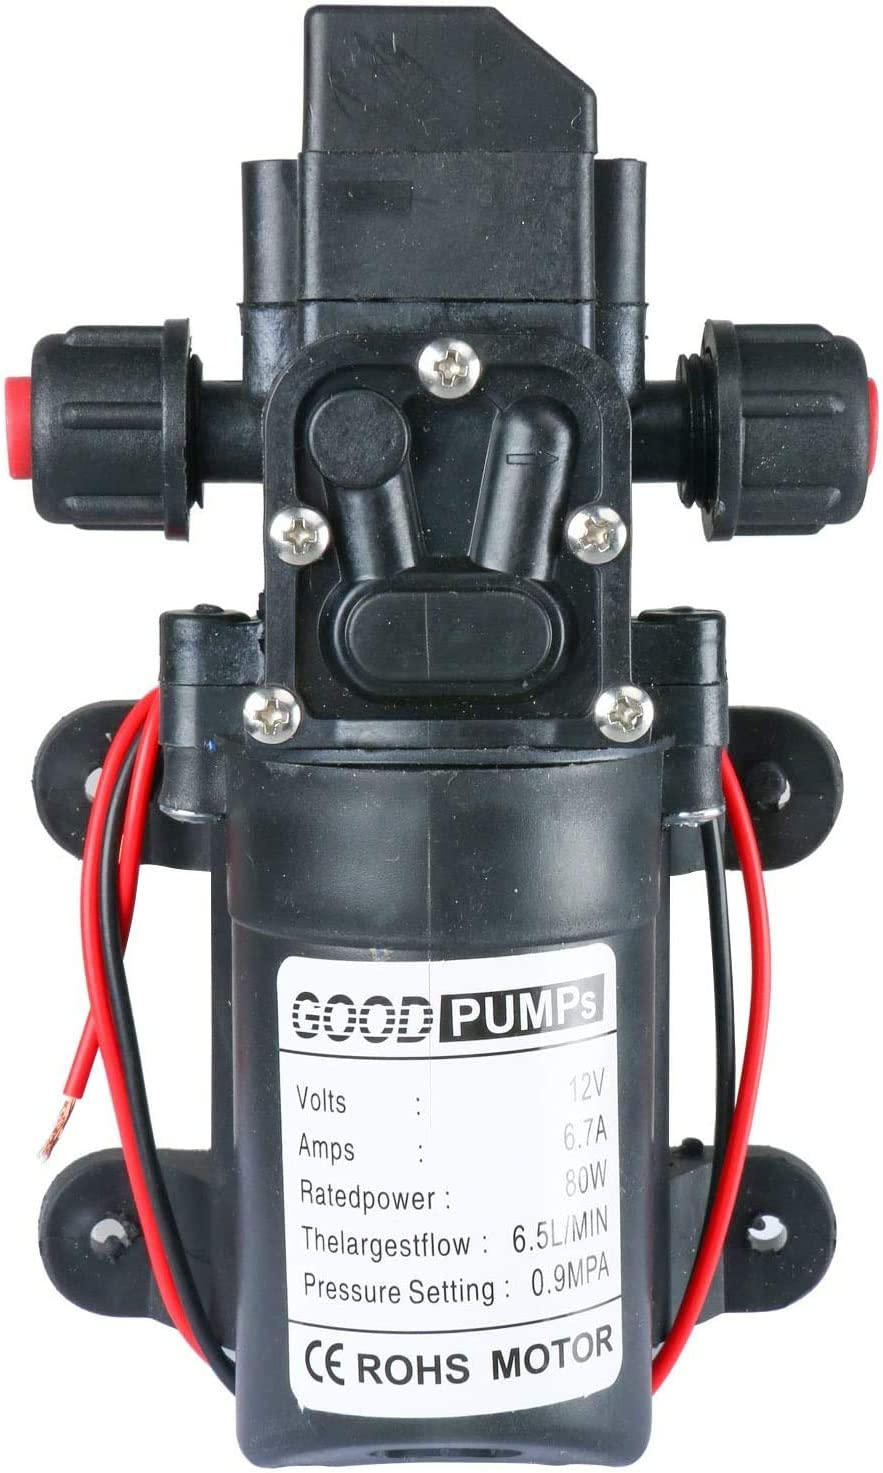 Amarine Made 12V Wasserdruckmembranpumpe 6,5 l//min 1,7 GPM 80W selbstansaugende RV Booster Spr/ühpumpe Mikropumpe para caravanas RV//barco marino